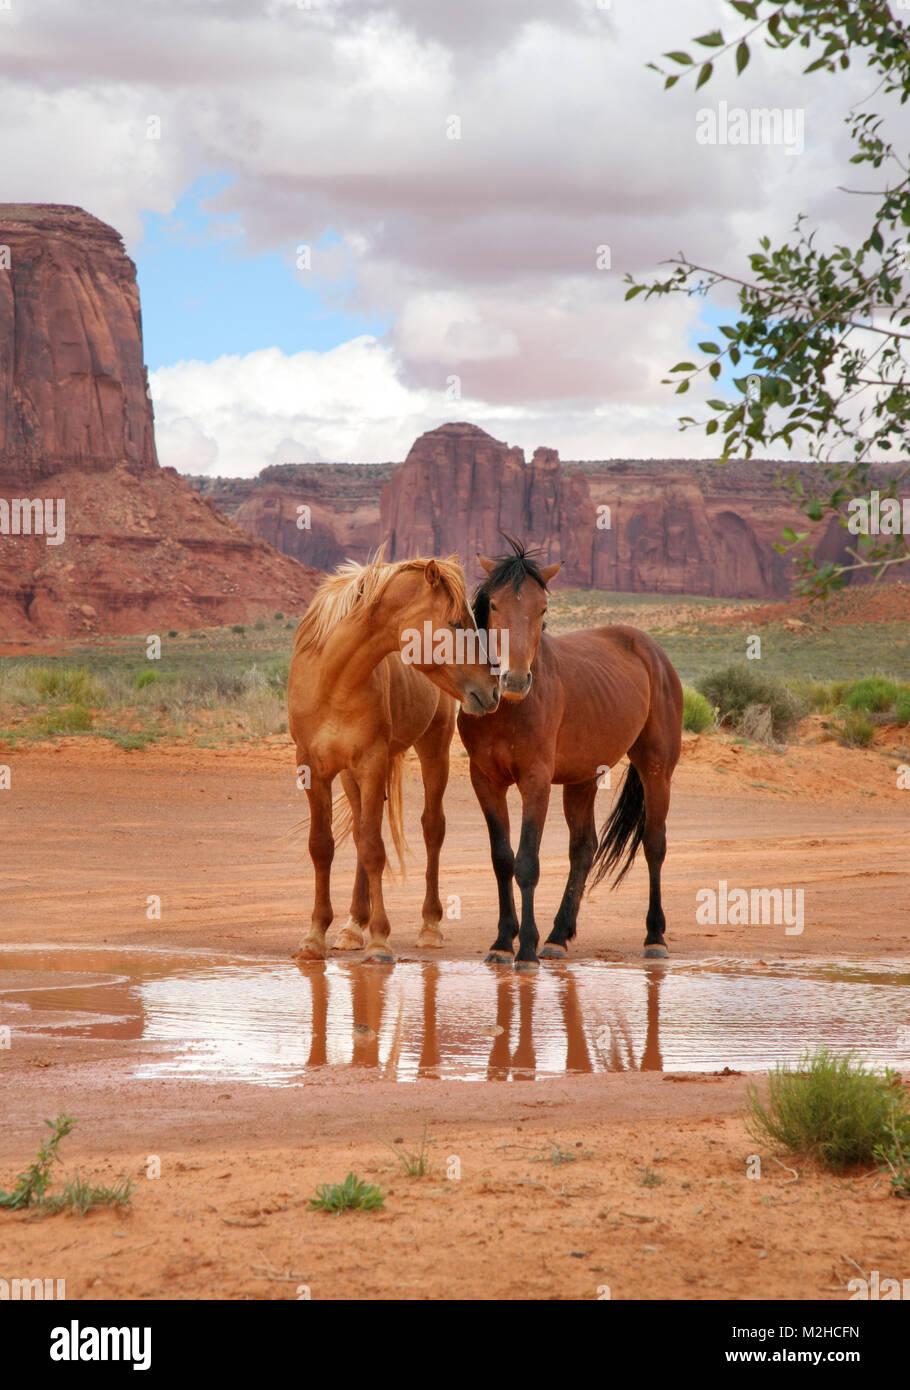 dos caballos salvajes juntos en un agujero de agua con cabezas cerca mostrando afecto Foto de stock